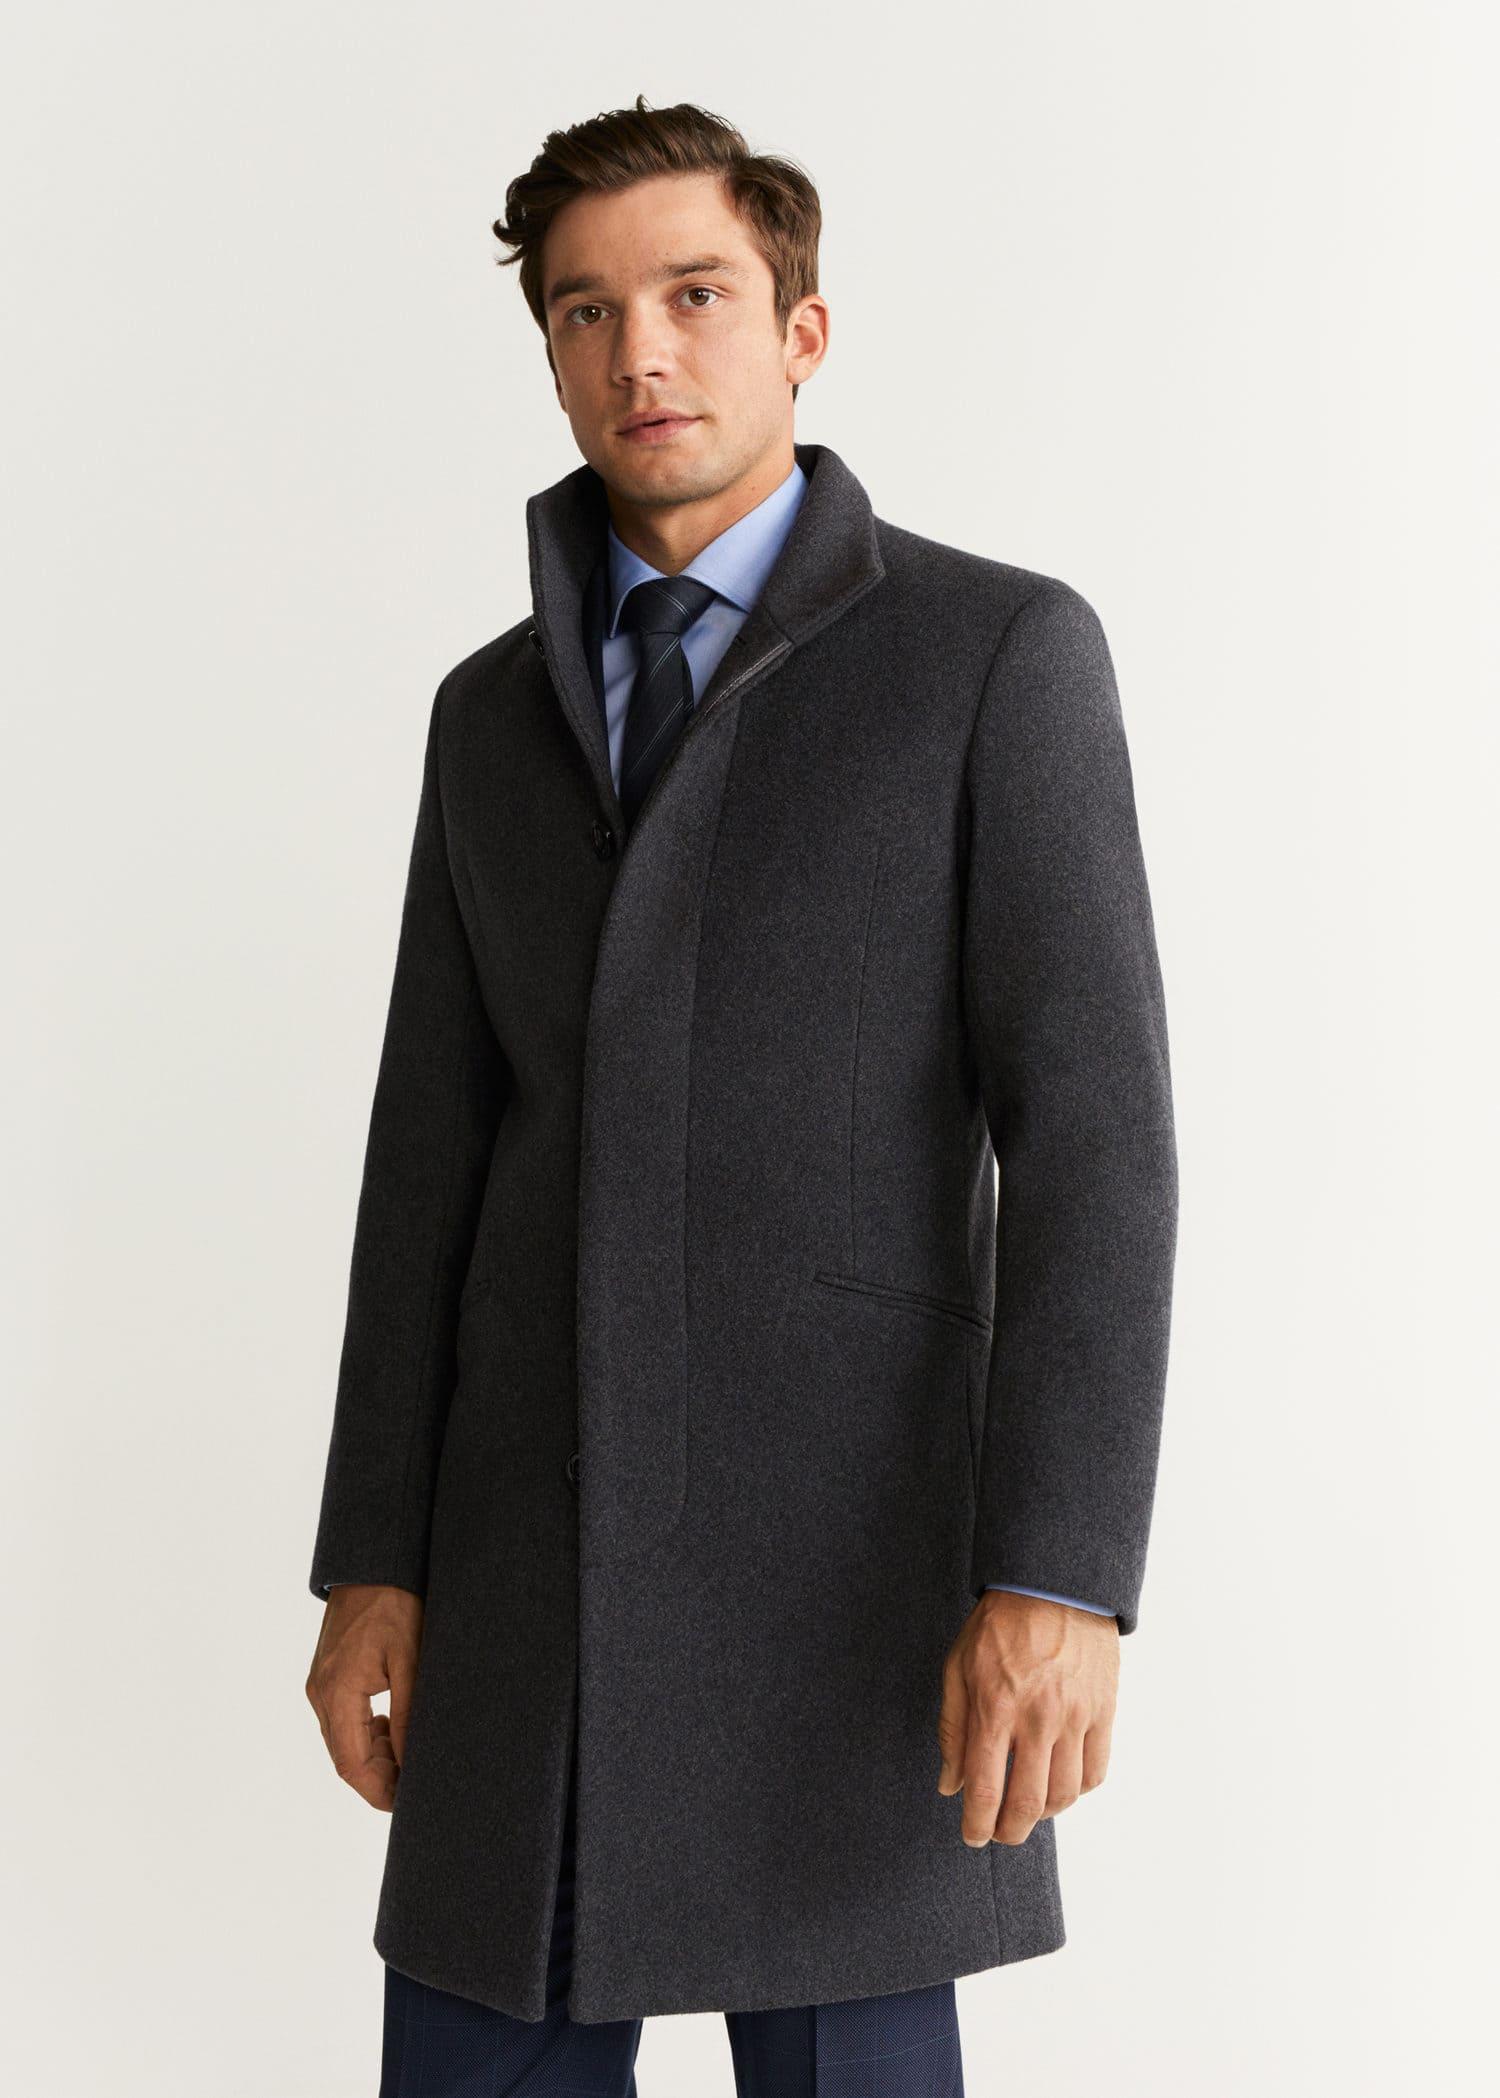 Manteau tailored laine Homme | Mango Man France